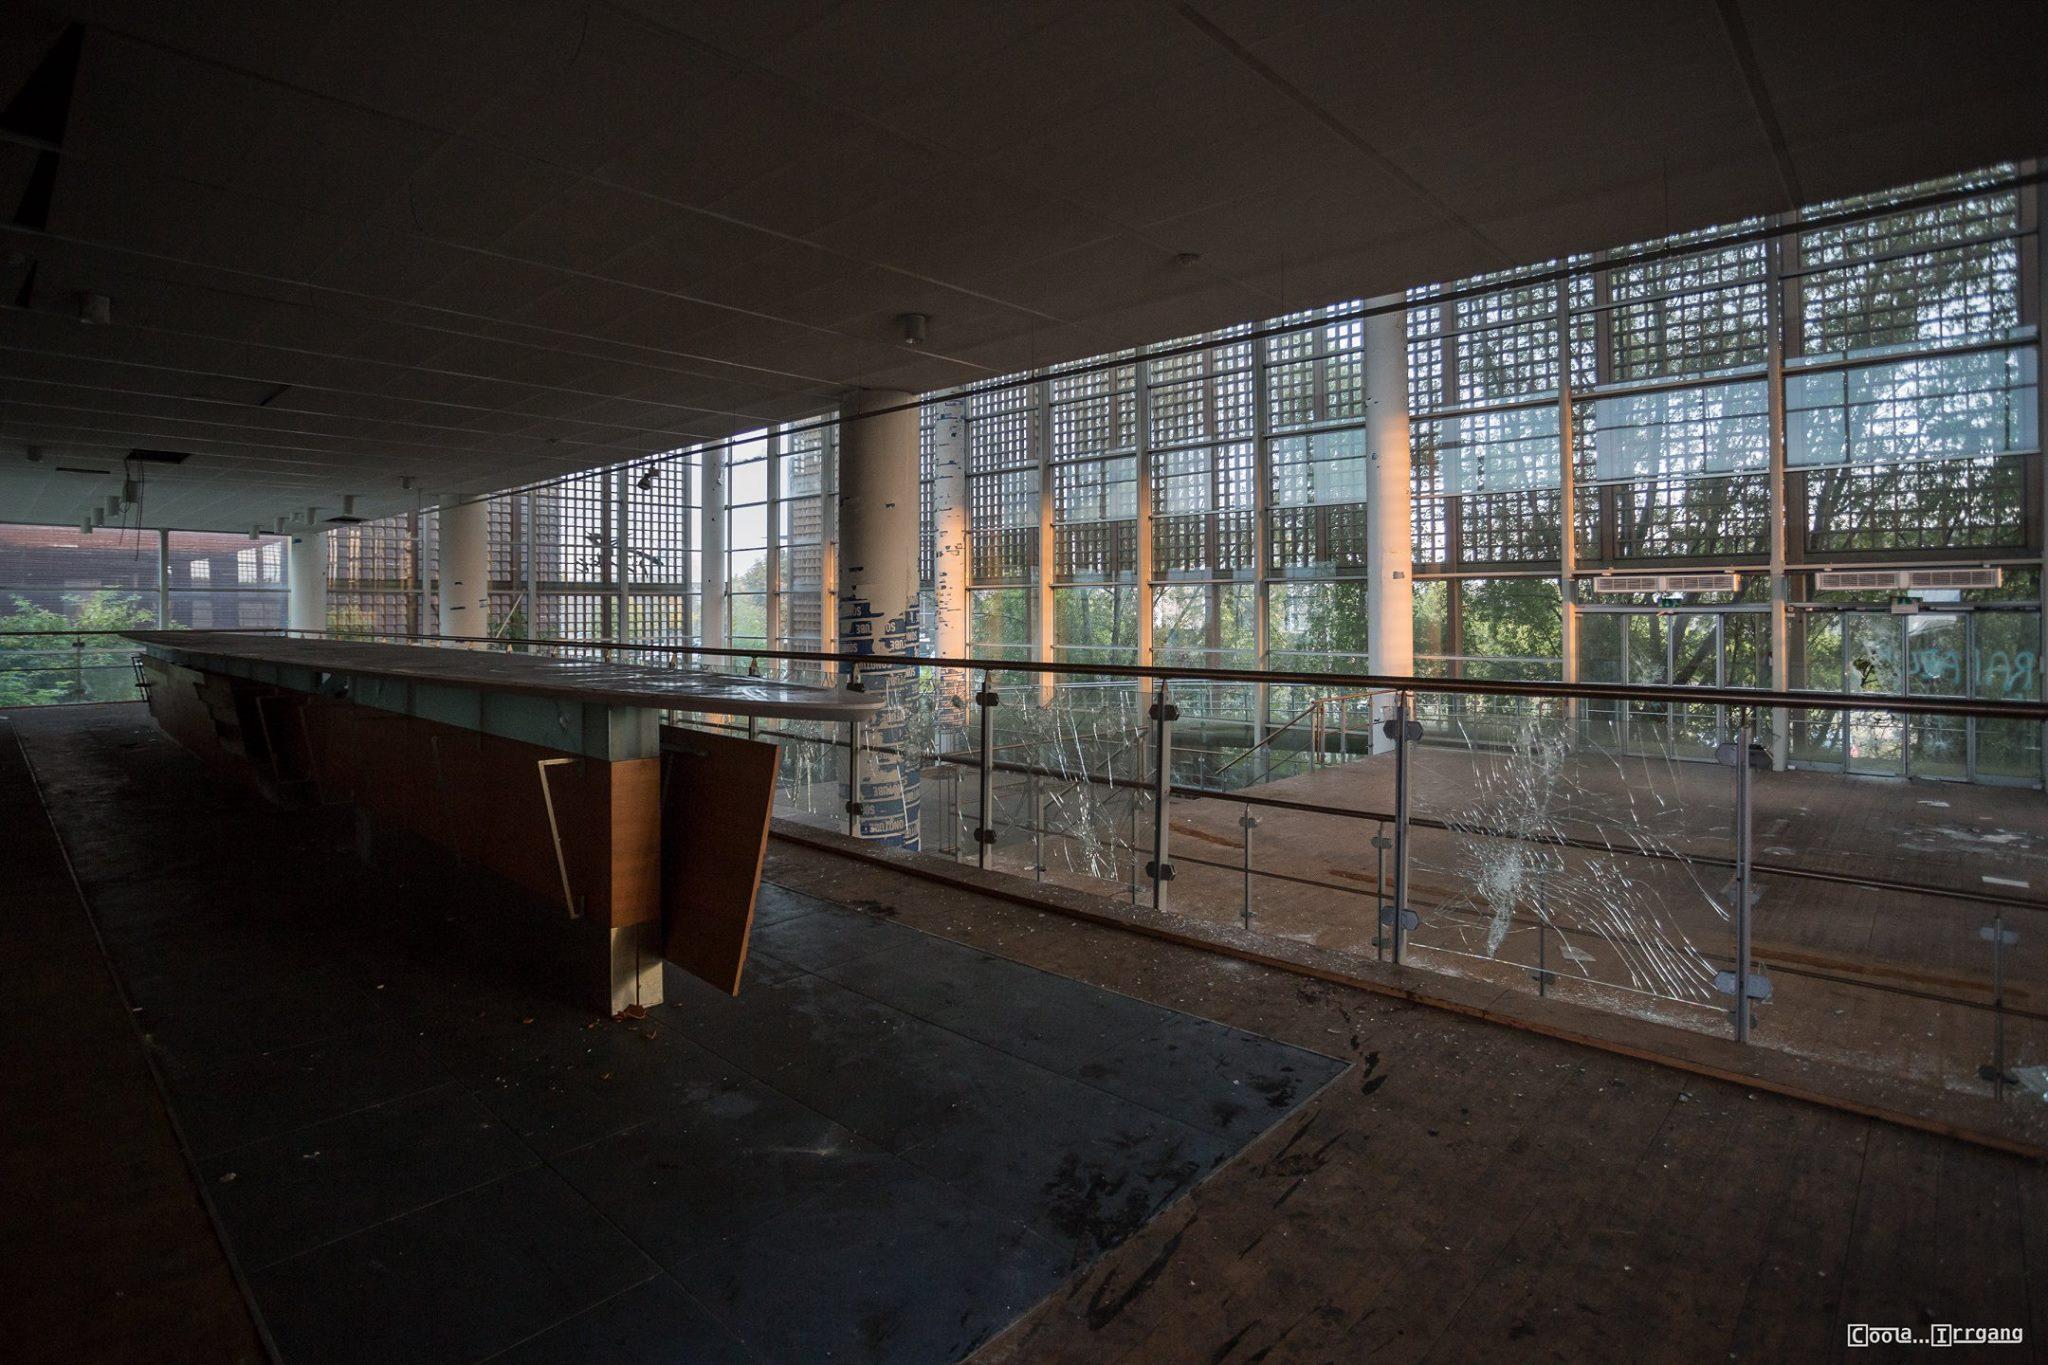 Expo 2000 Türkischer Pavillon